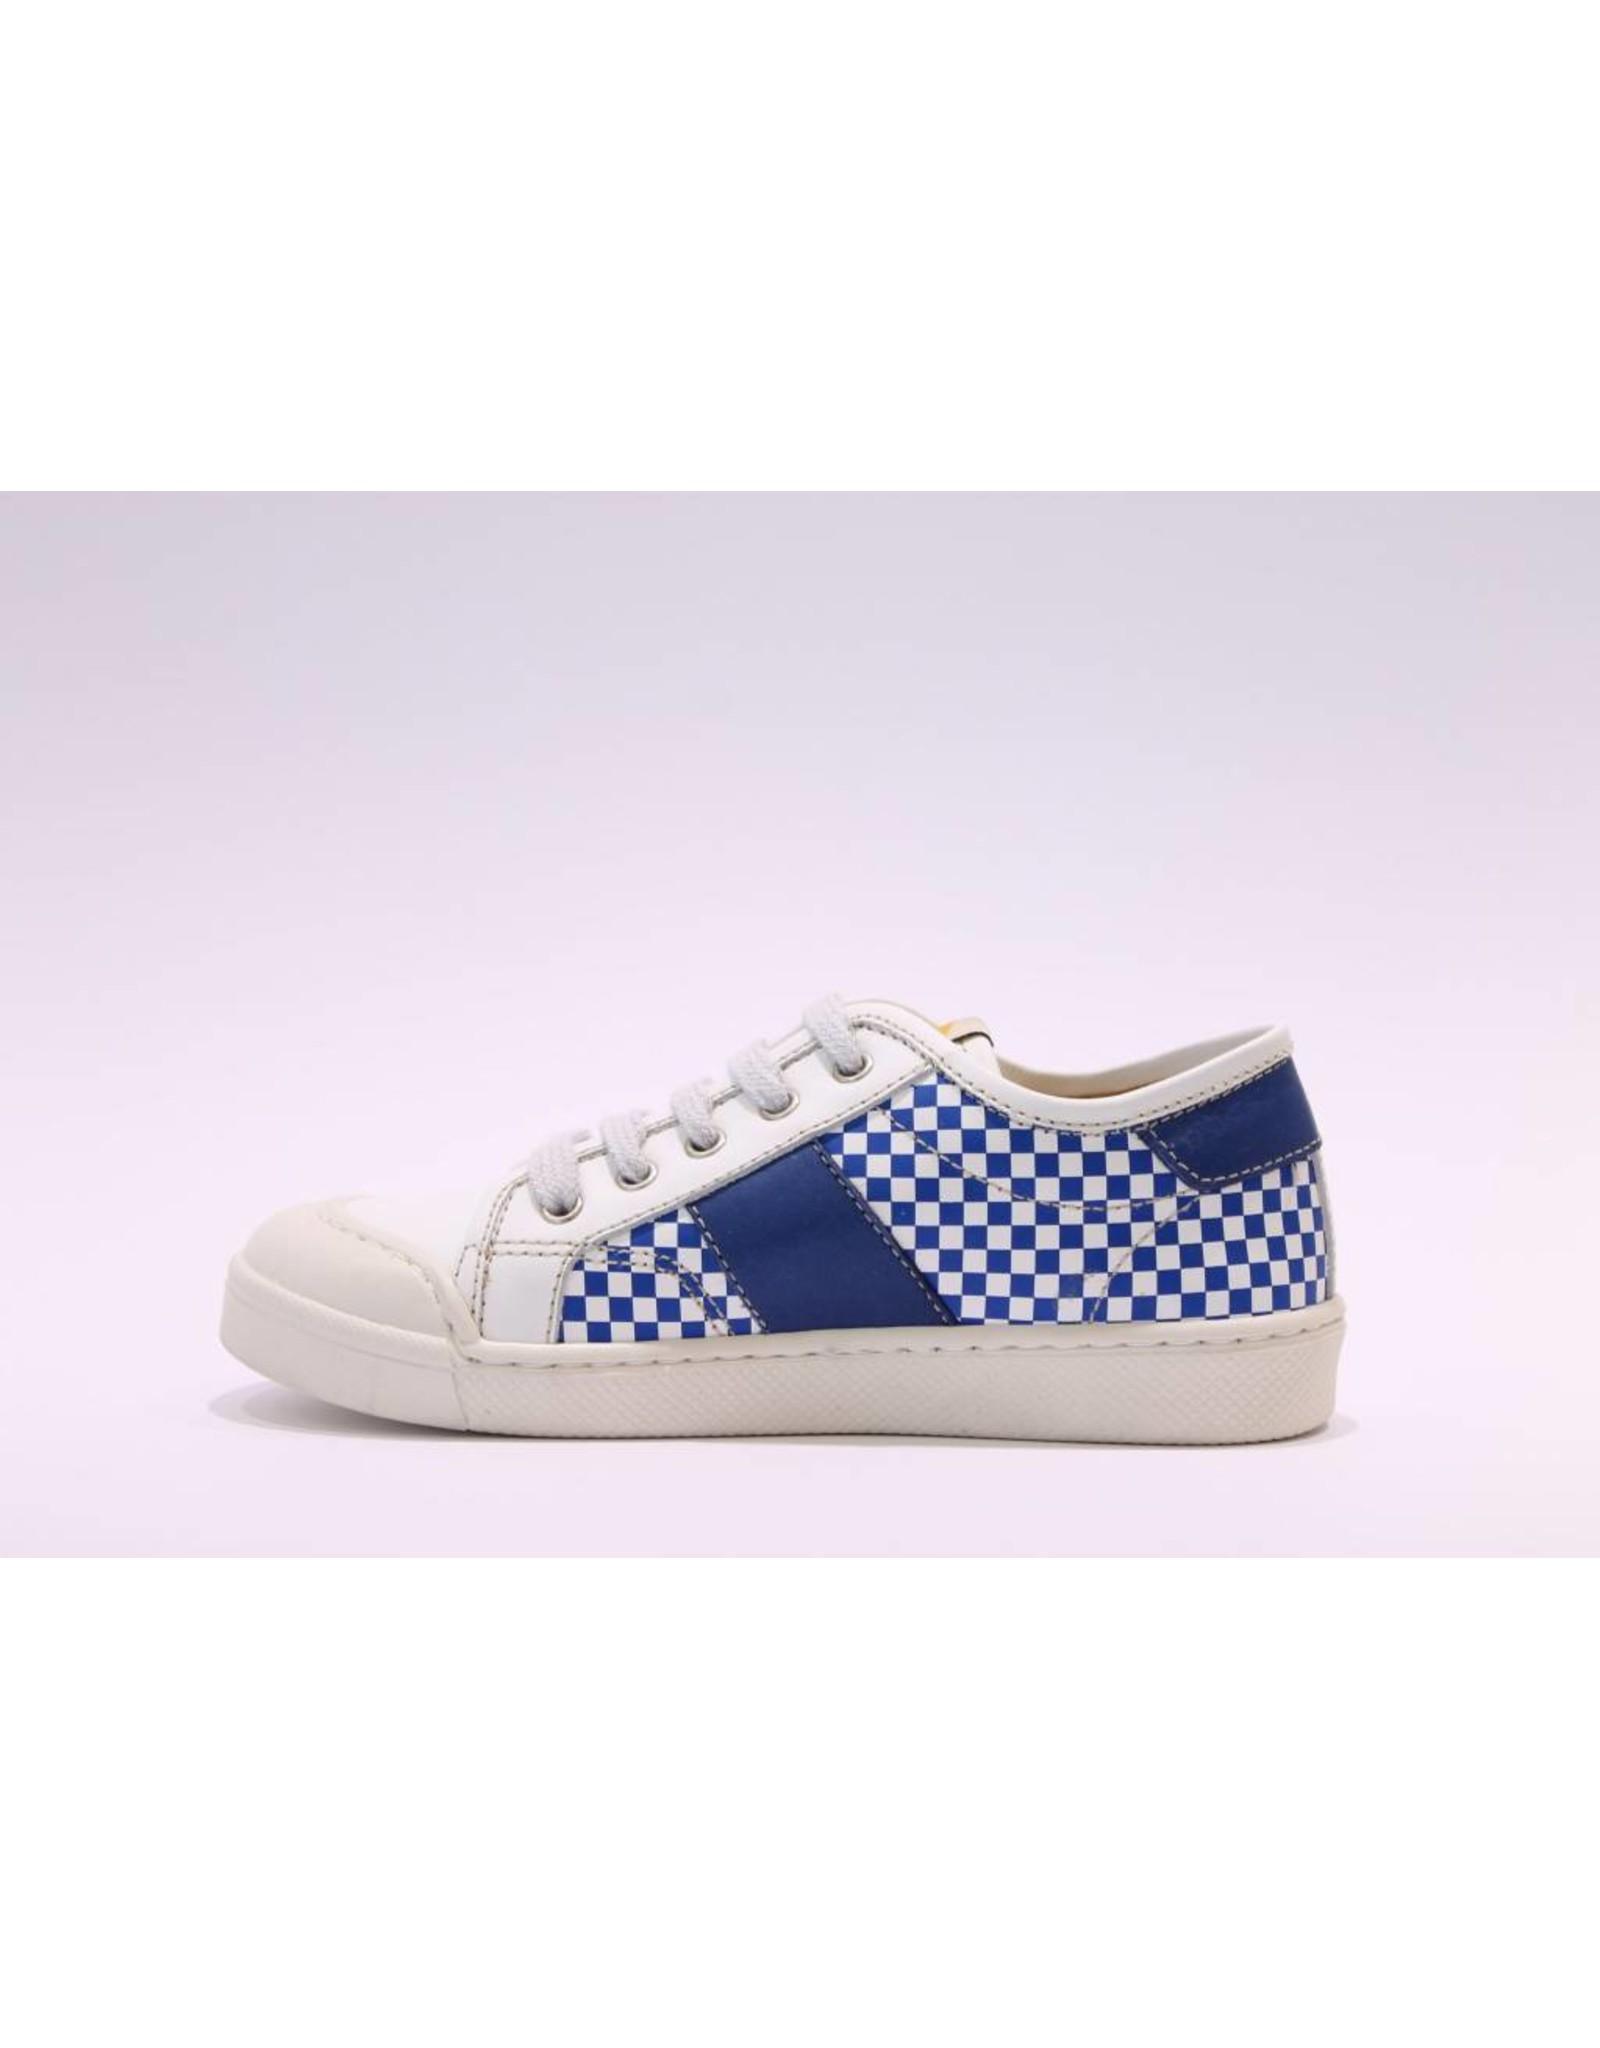 Ocra sneaker blauw/wit blokjes